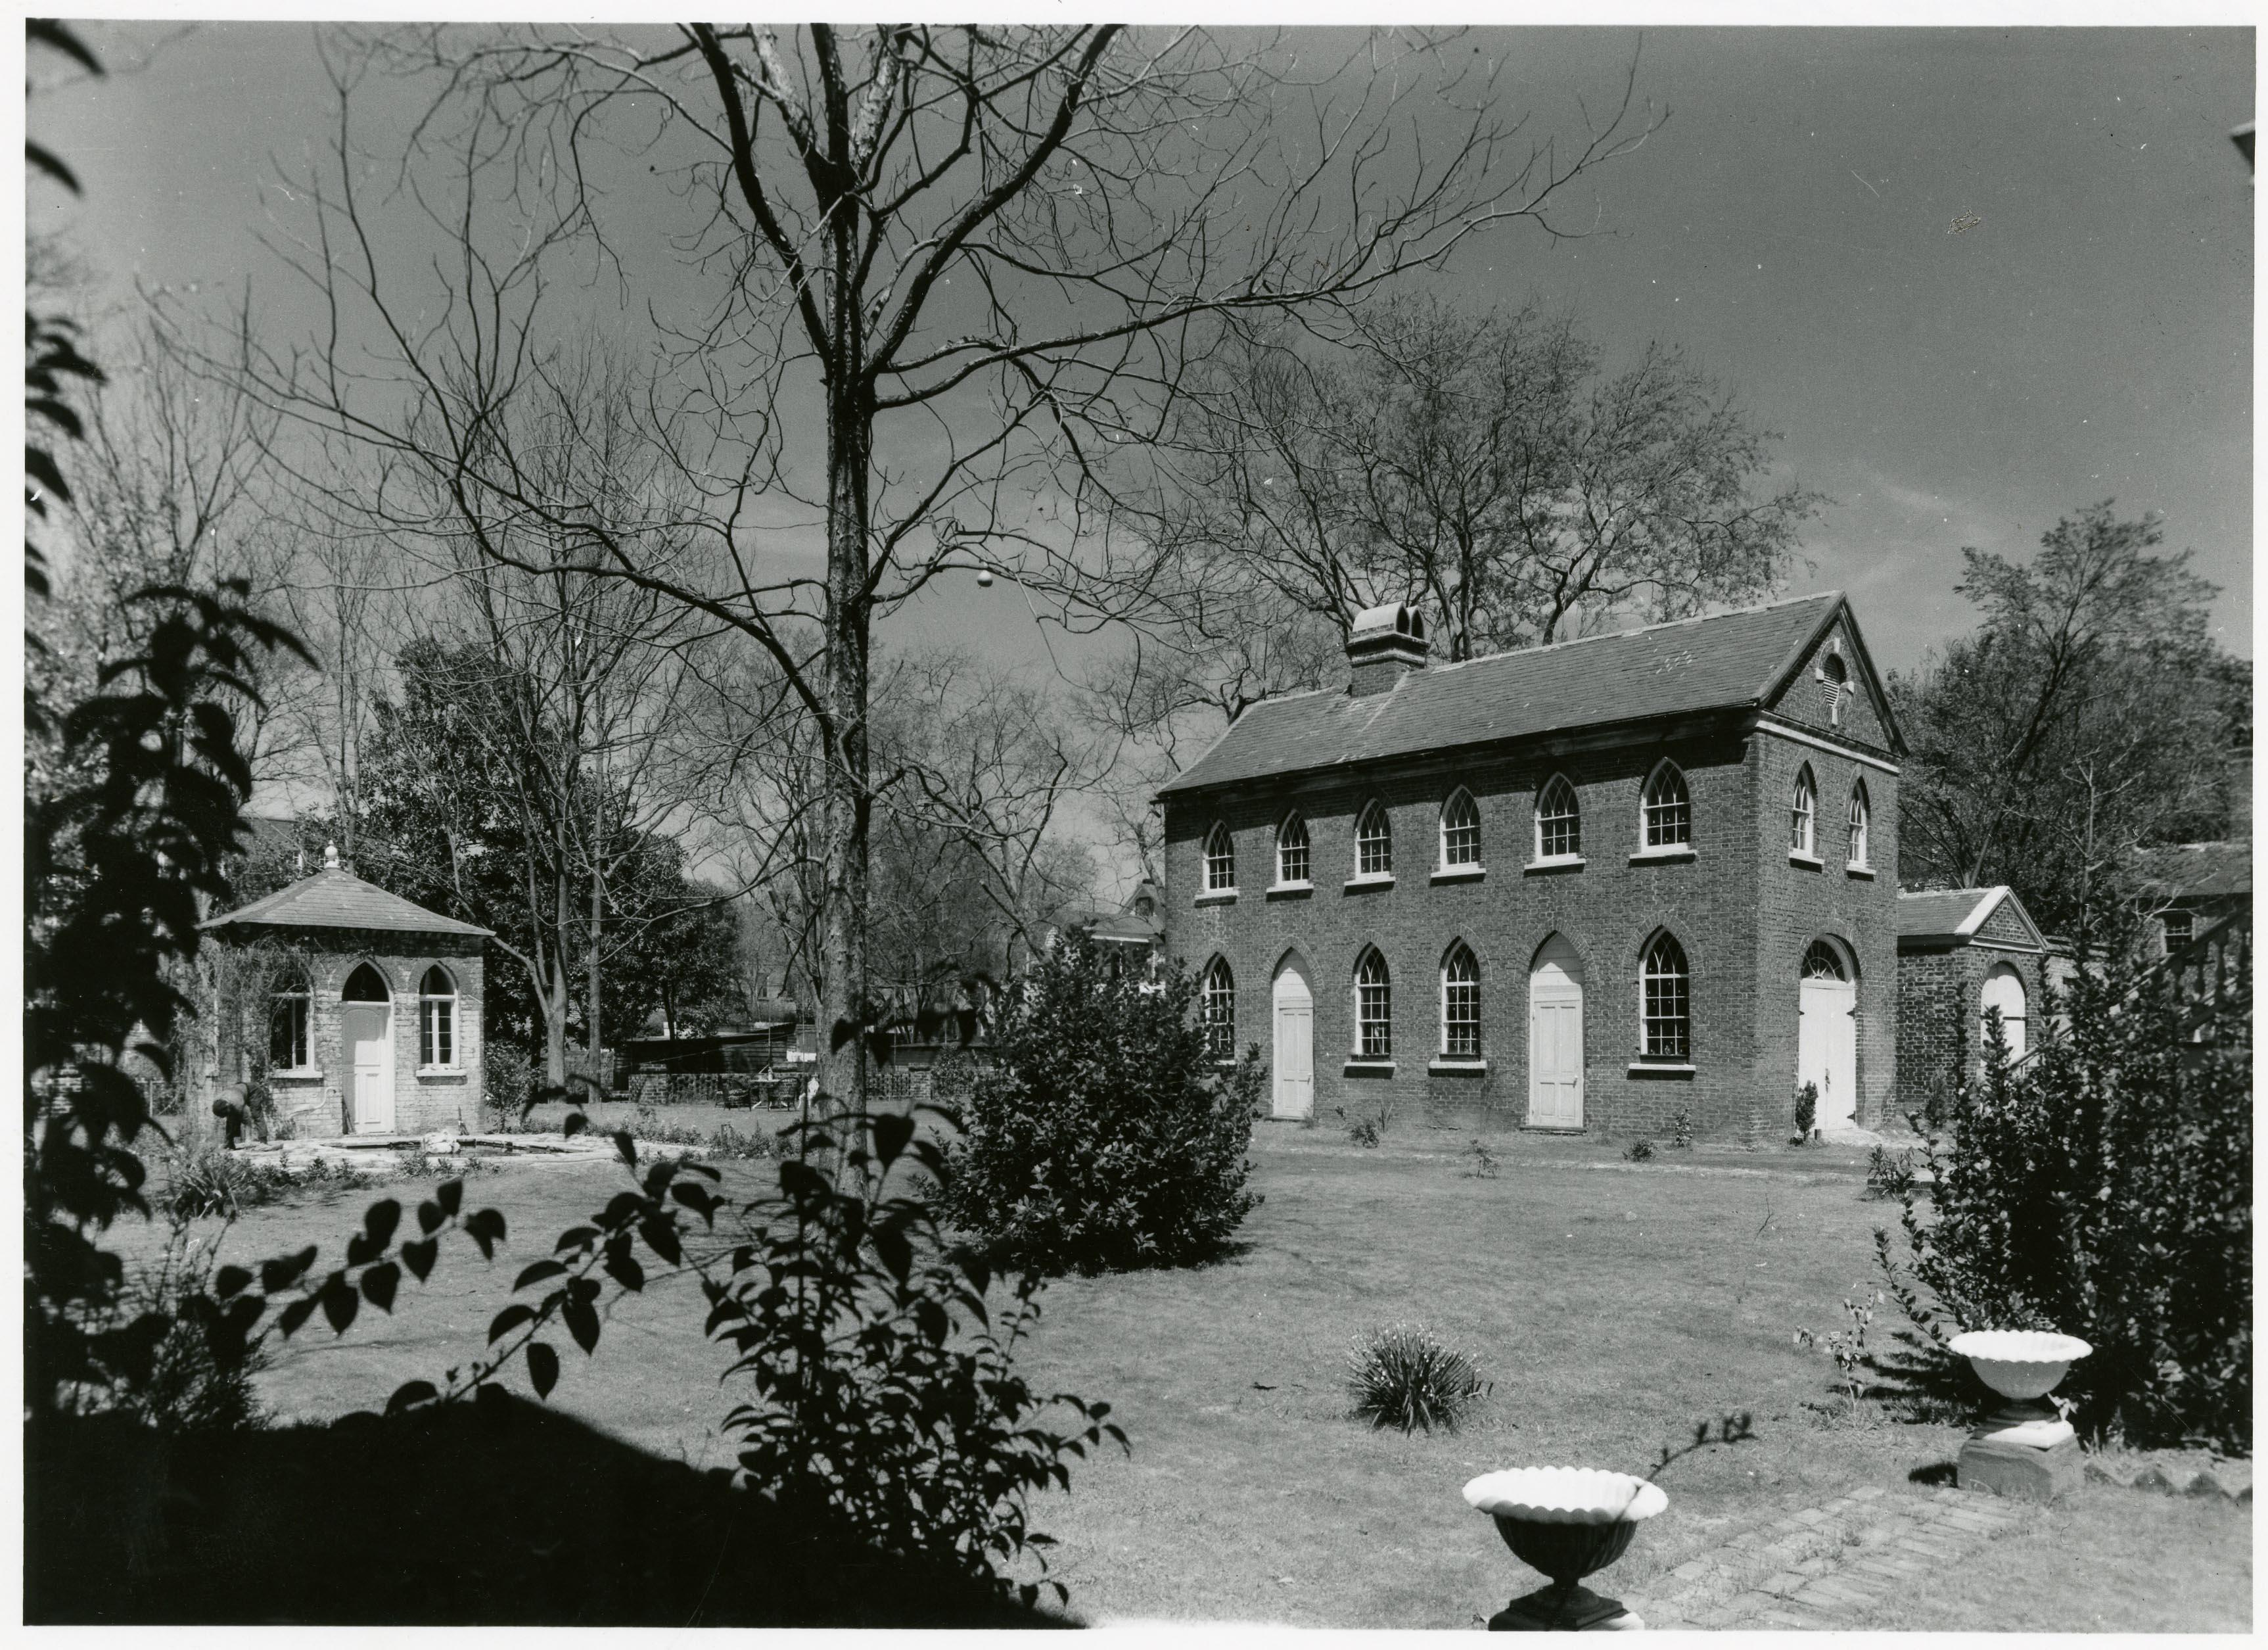 Blacklock House